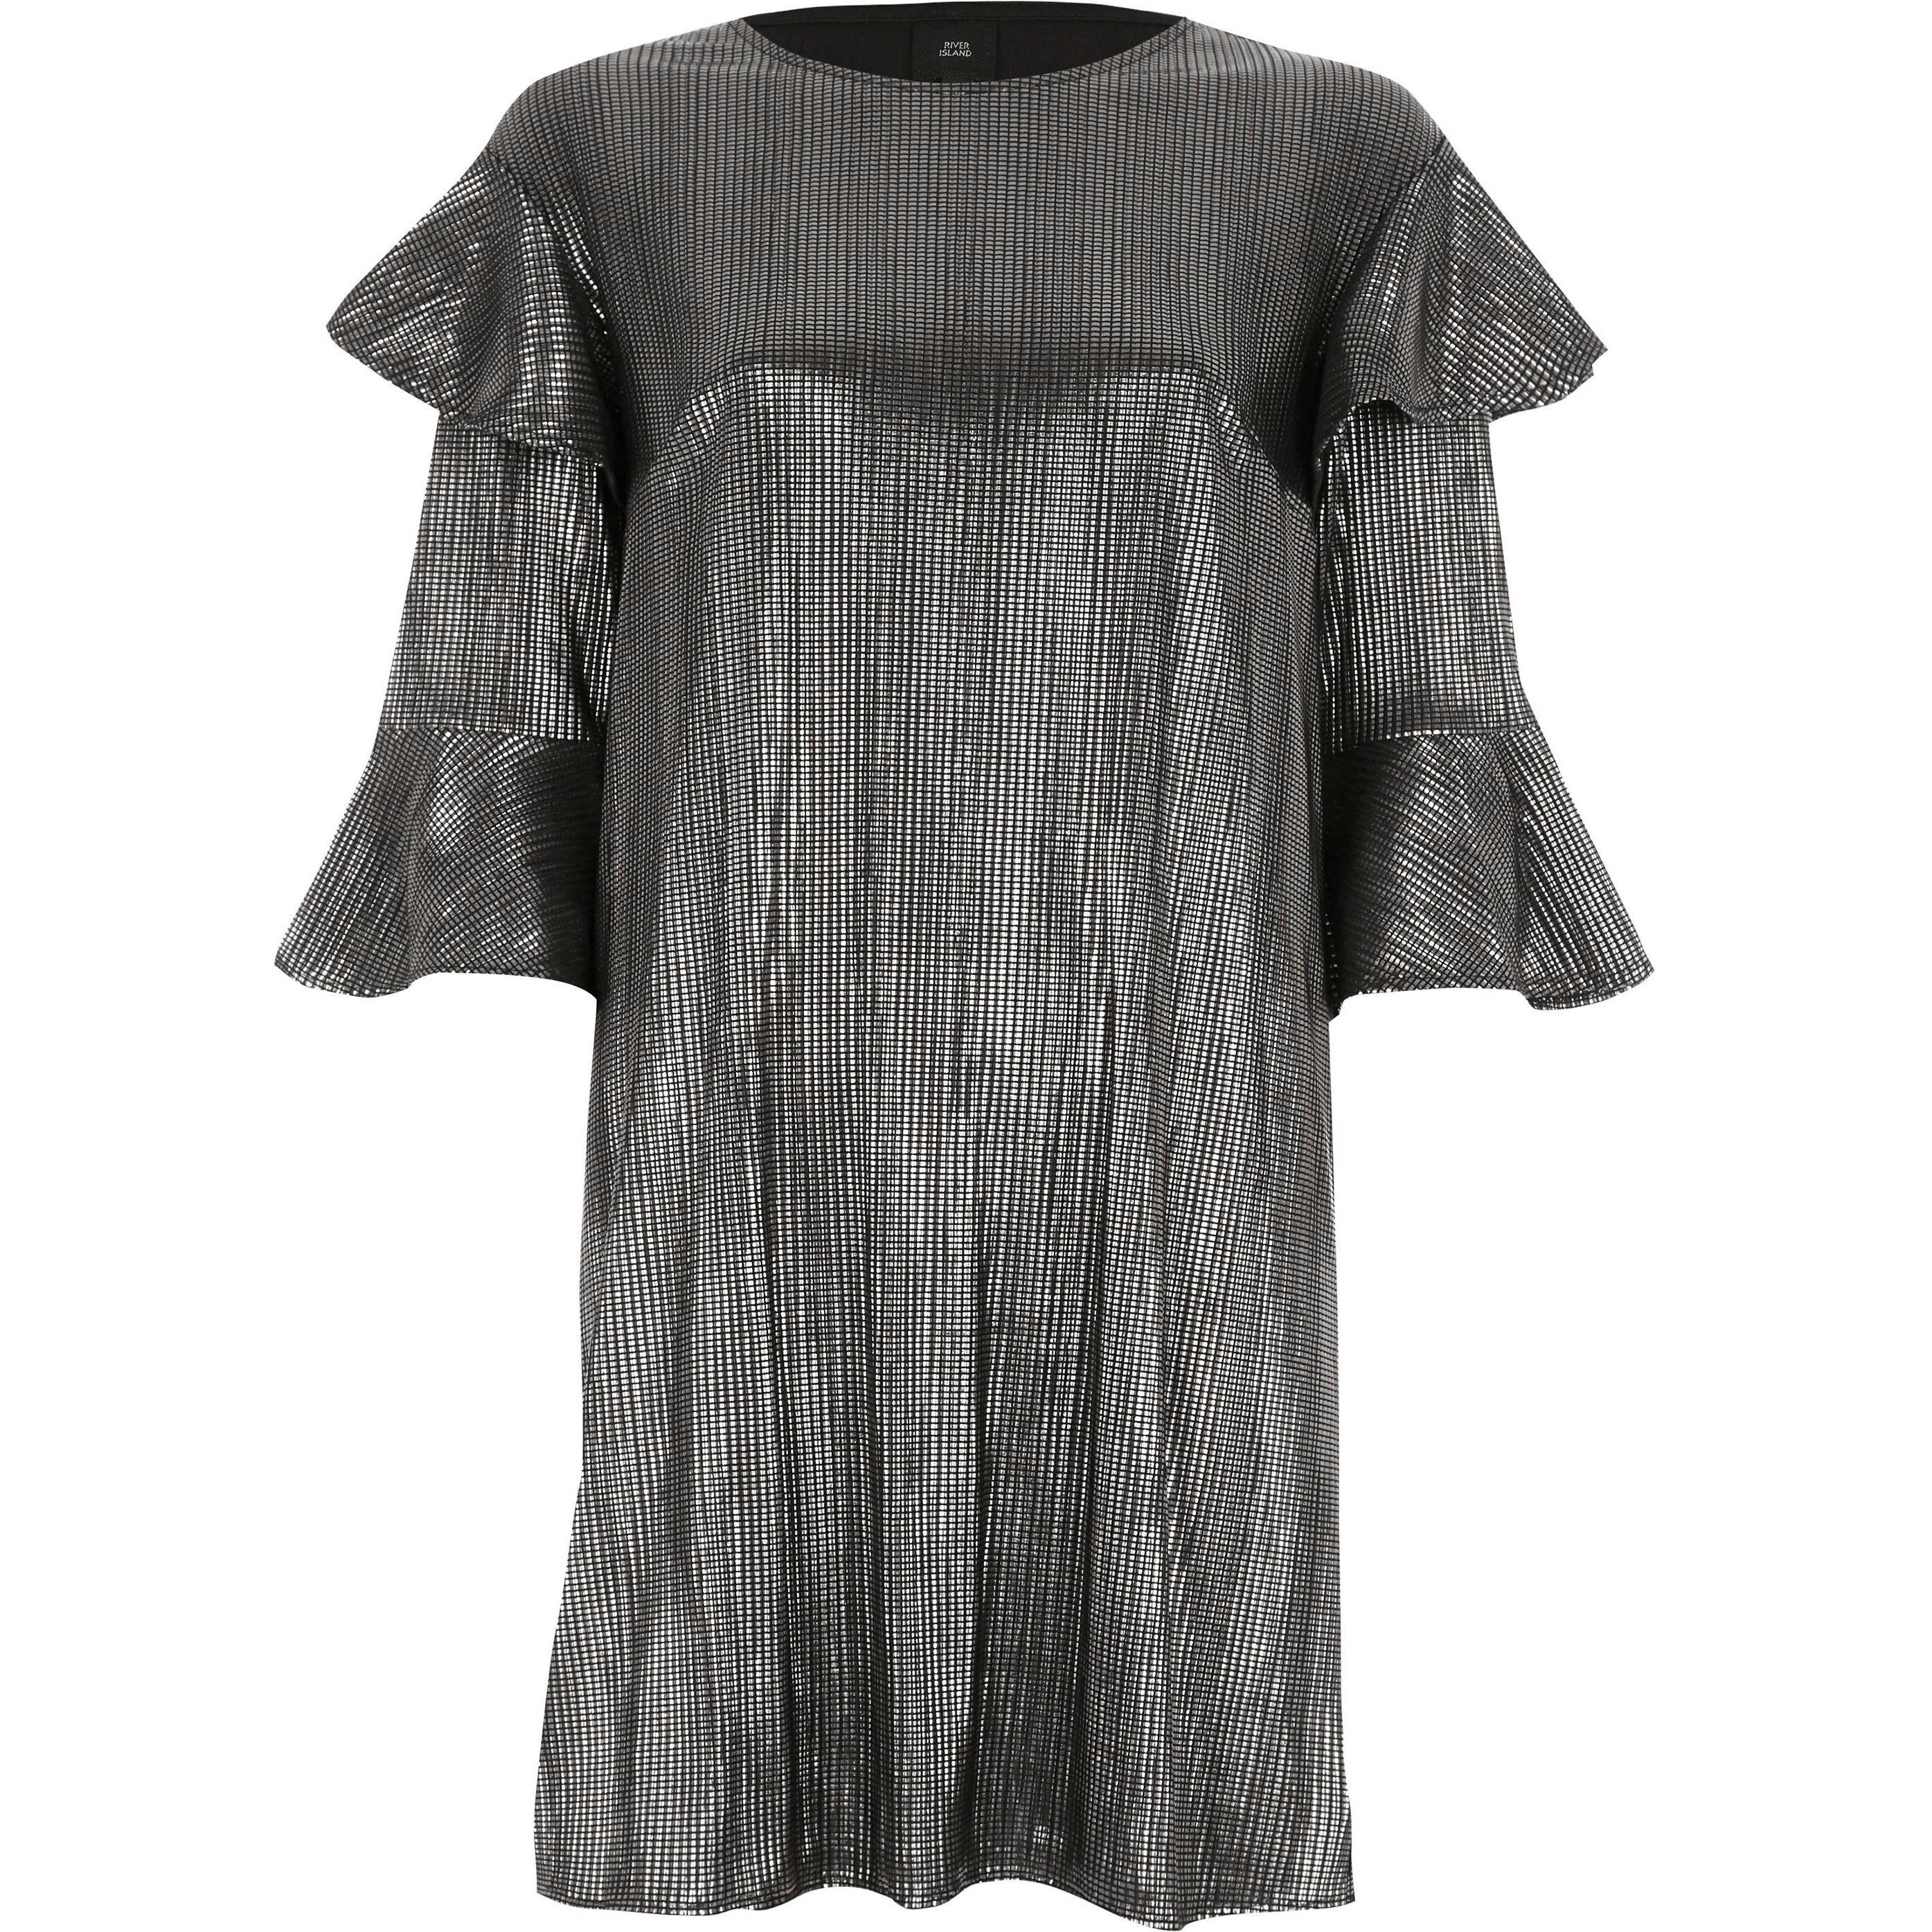 River Island Silver foil frill T-shirt dress (6)